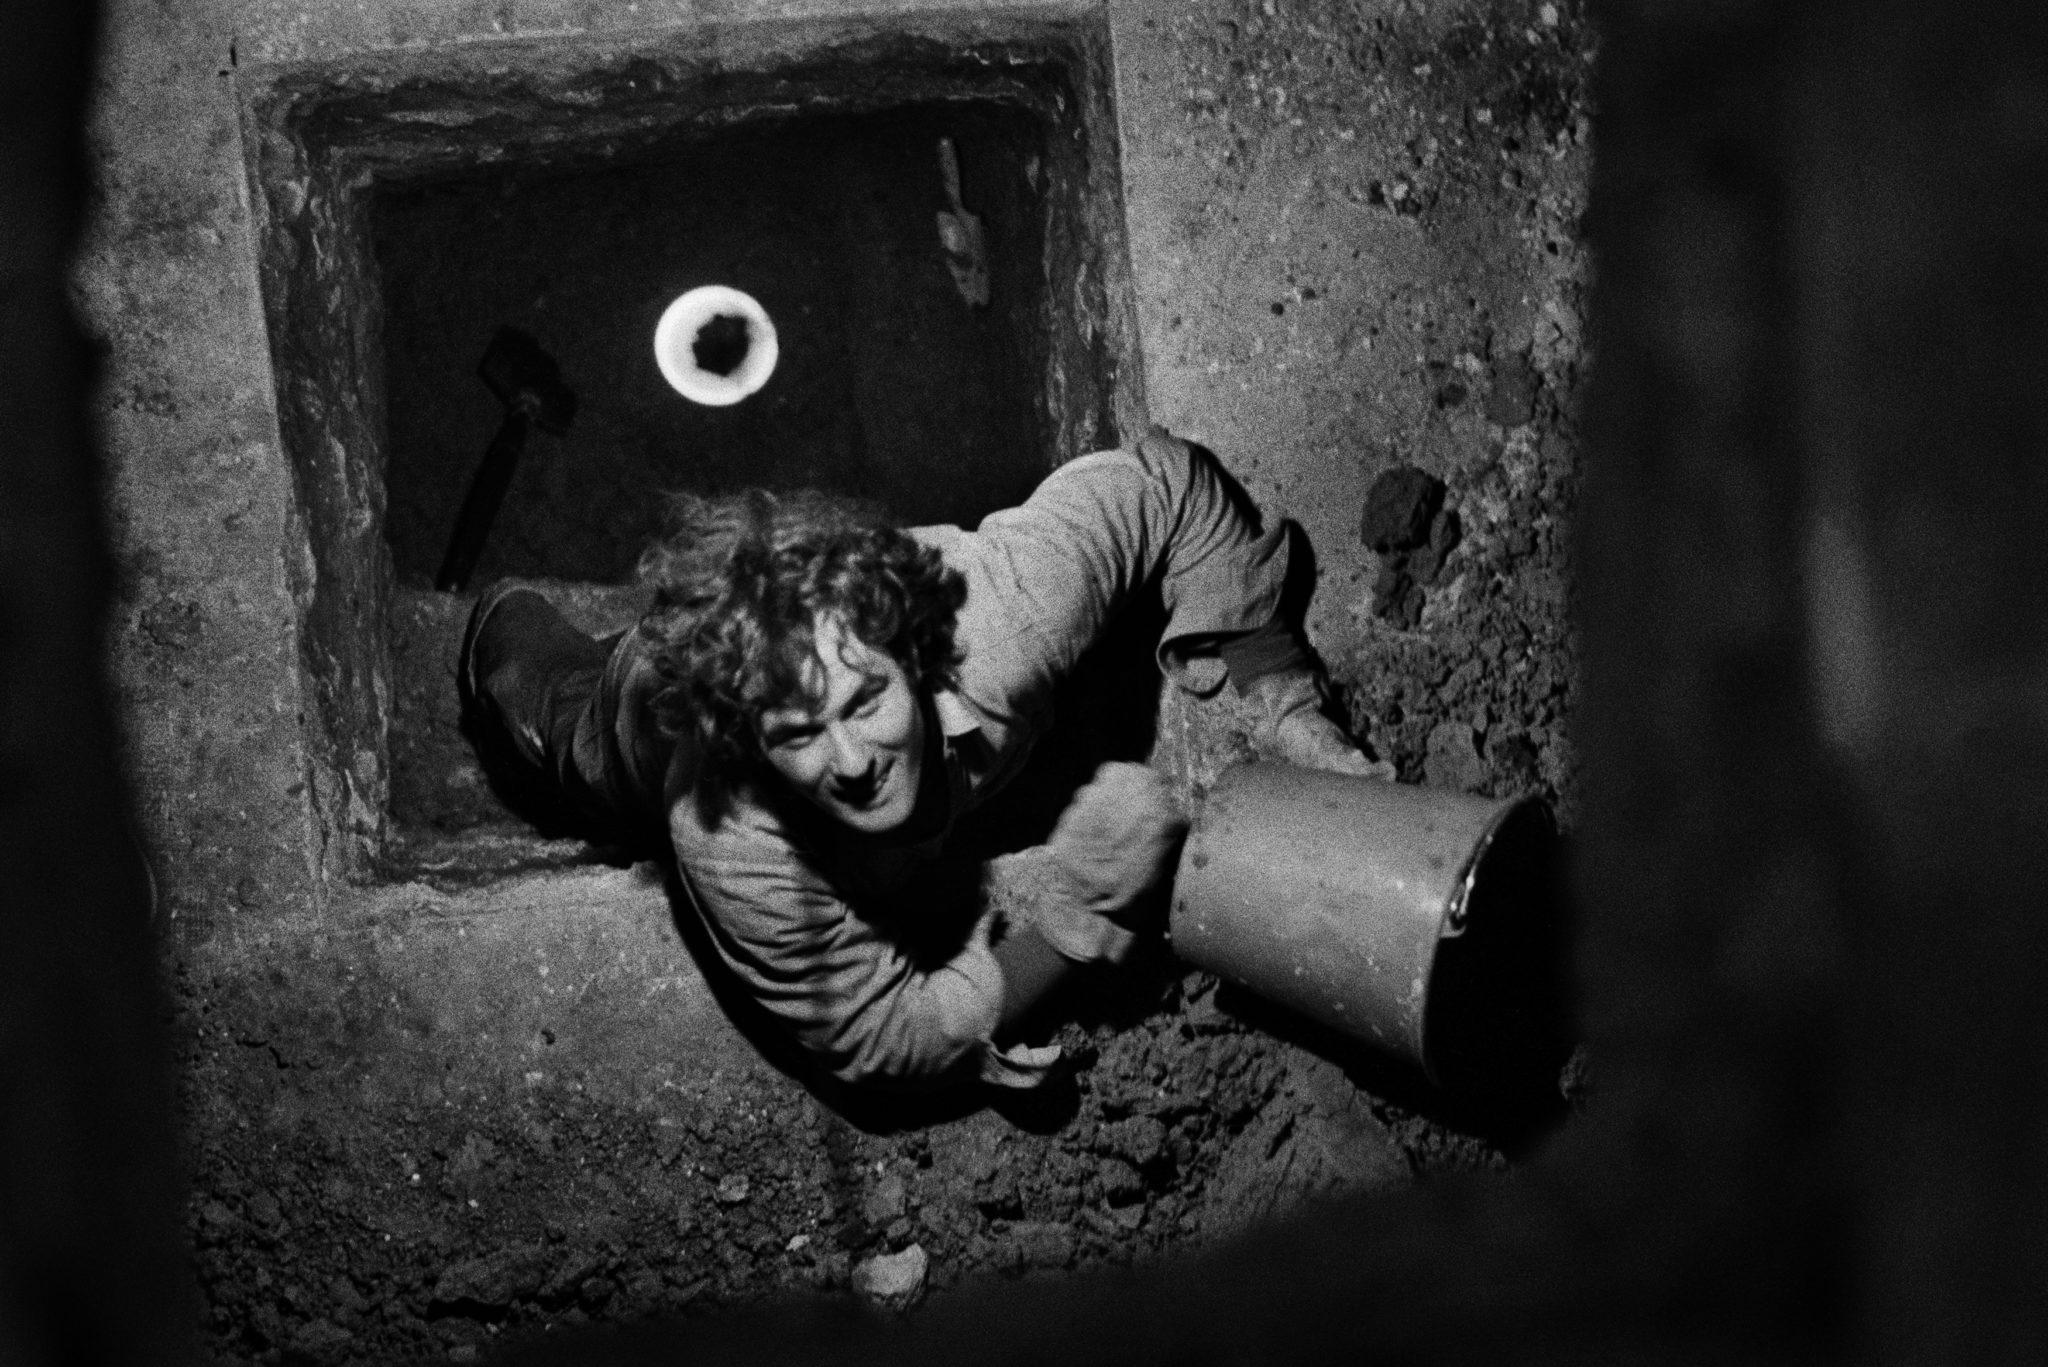 Harry Gruyaert Gordon Matta-Clark travaillant à Descending Steps for Batan, Galerie Yvon Lambert, Paris, 1977 © Harry Gruyaert / Magnum Photos